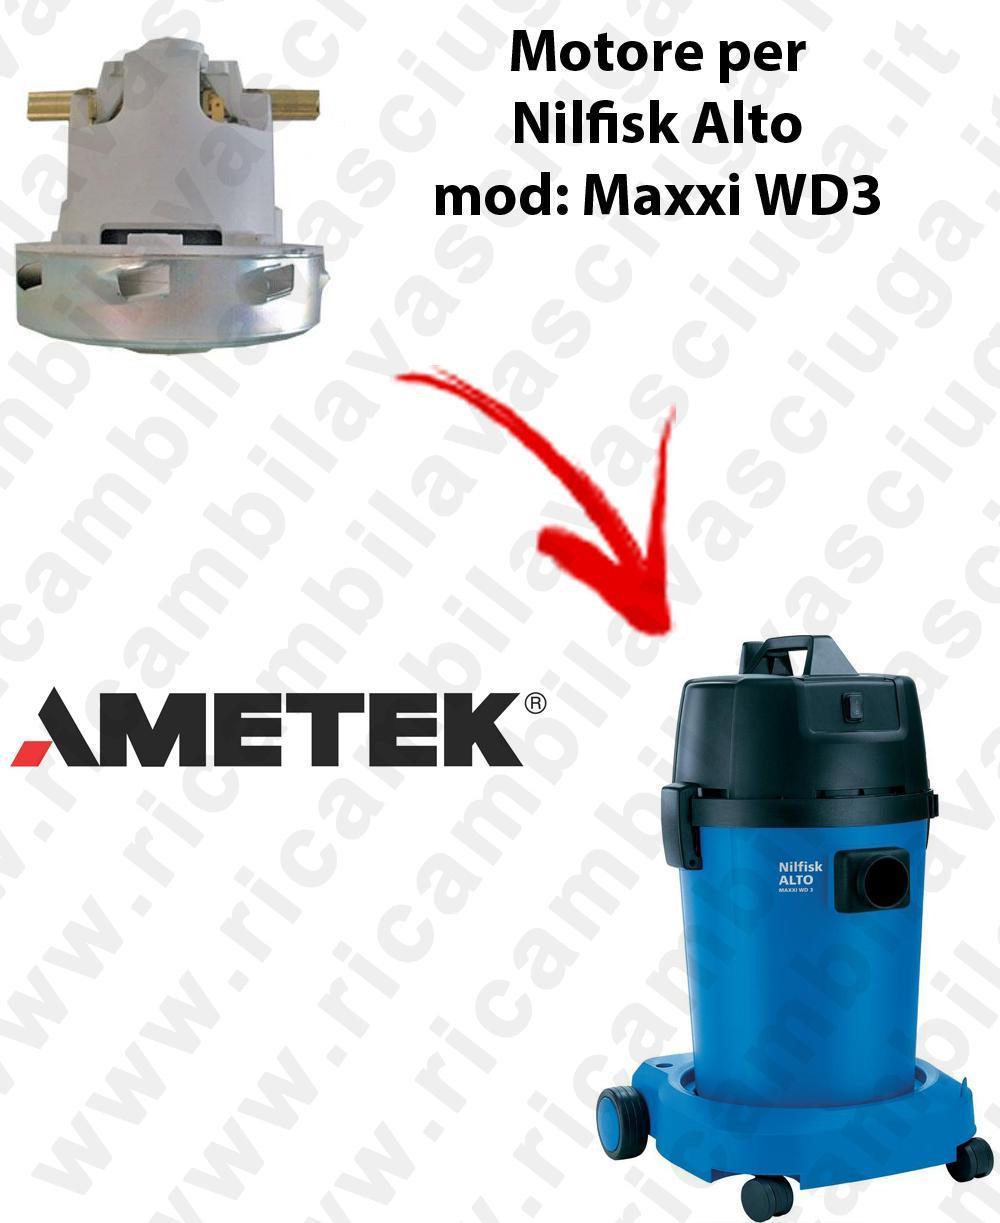 MAXXI WD3  Ametek Vacuum Motor for Vacuum cleaner Nilfisk Alto